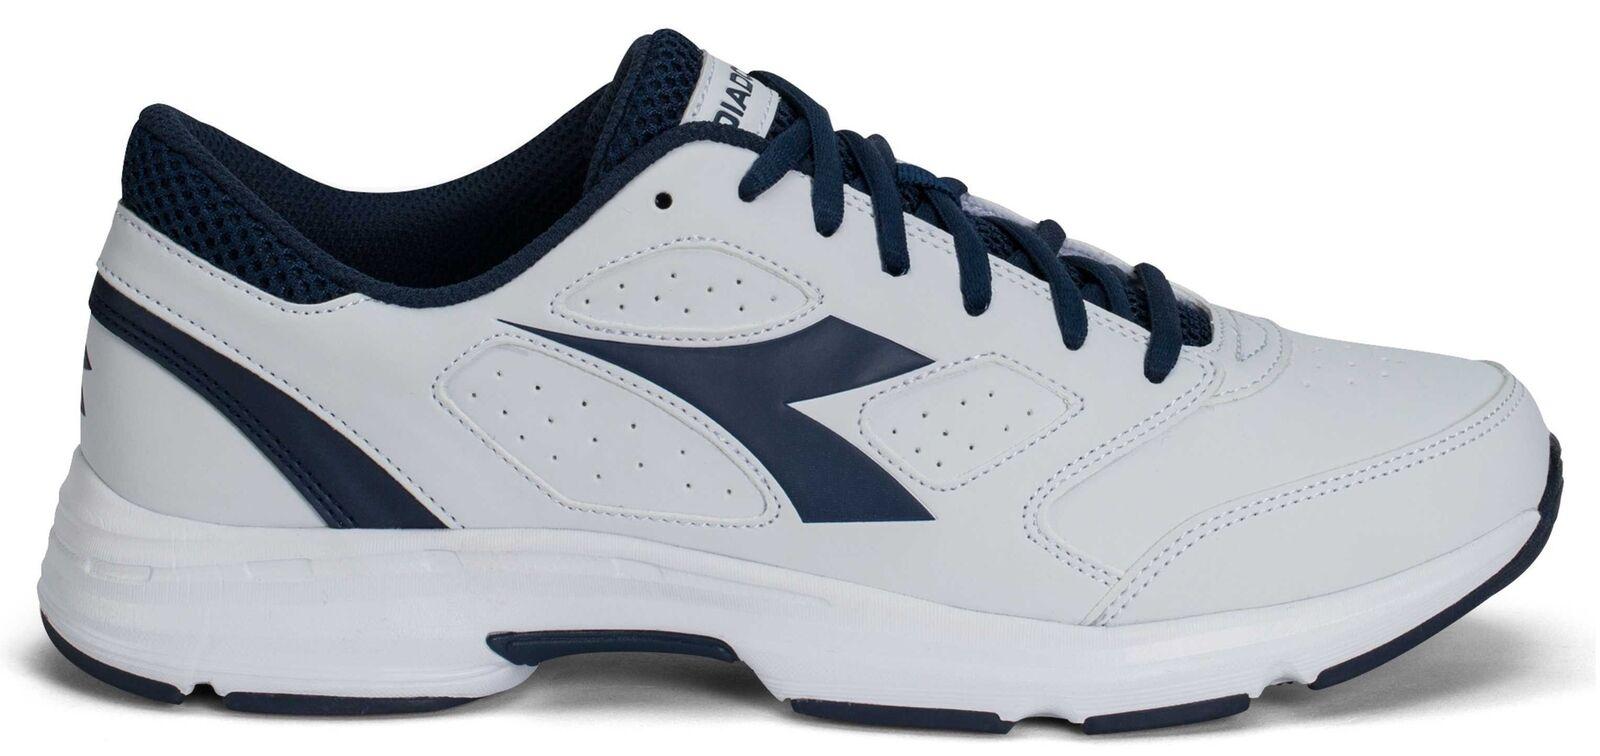 Diadora Scarpa Running Sneaker Jogging men Shape 7 sl White saltire navy shoes